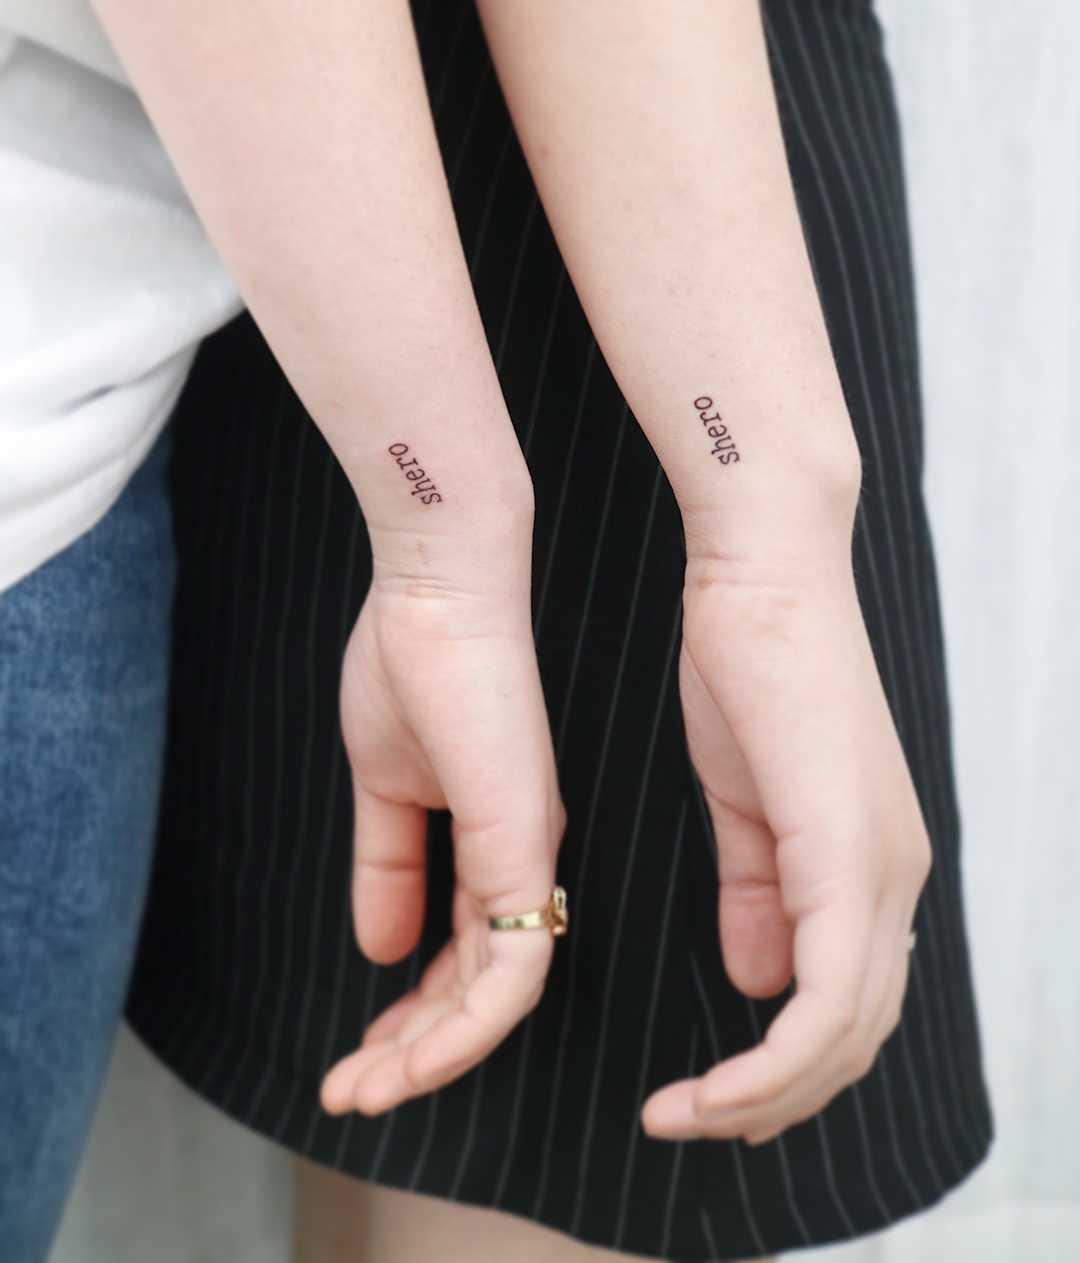 Shero tattoos by tattooist Nemo